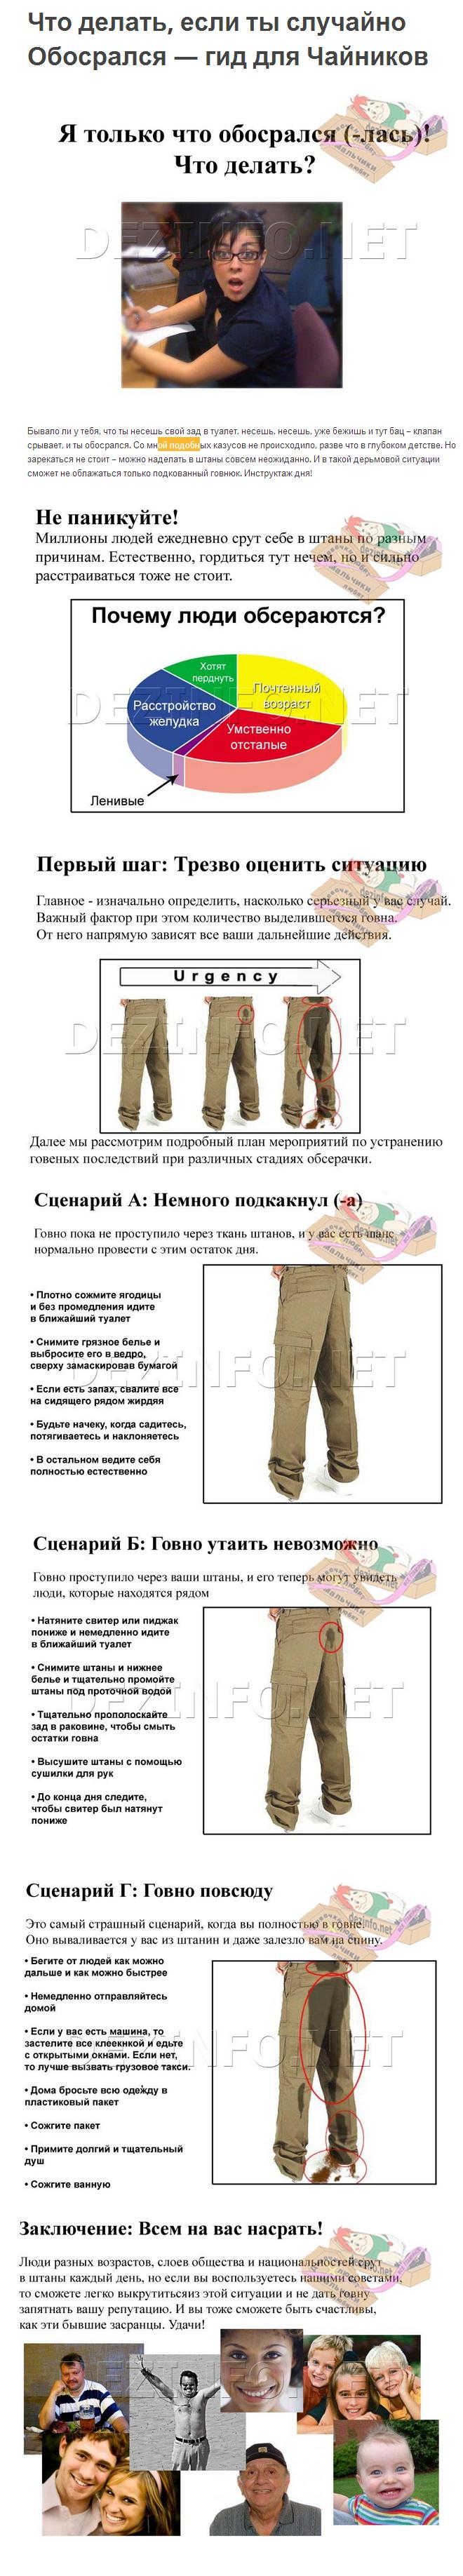 инструкцыя